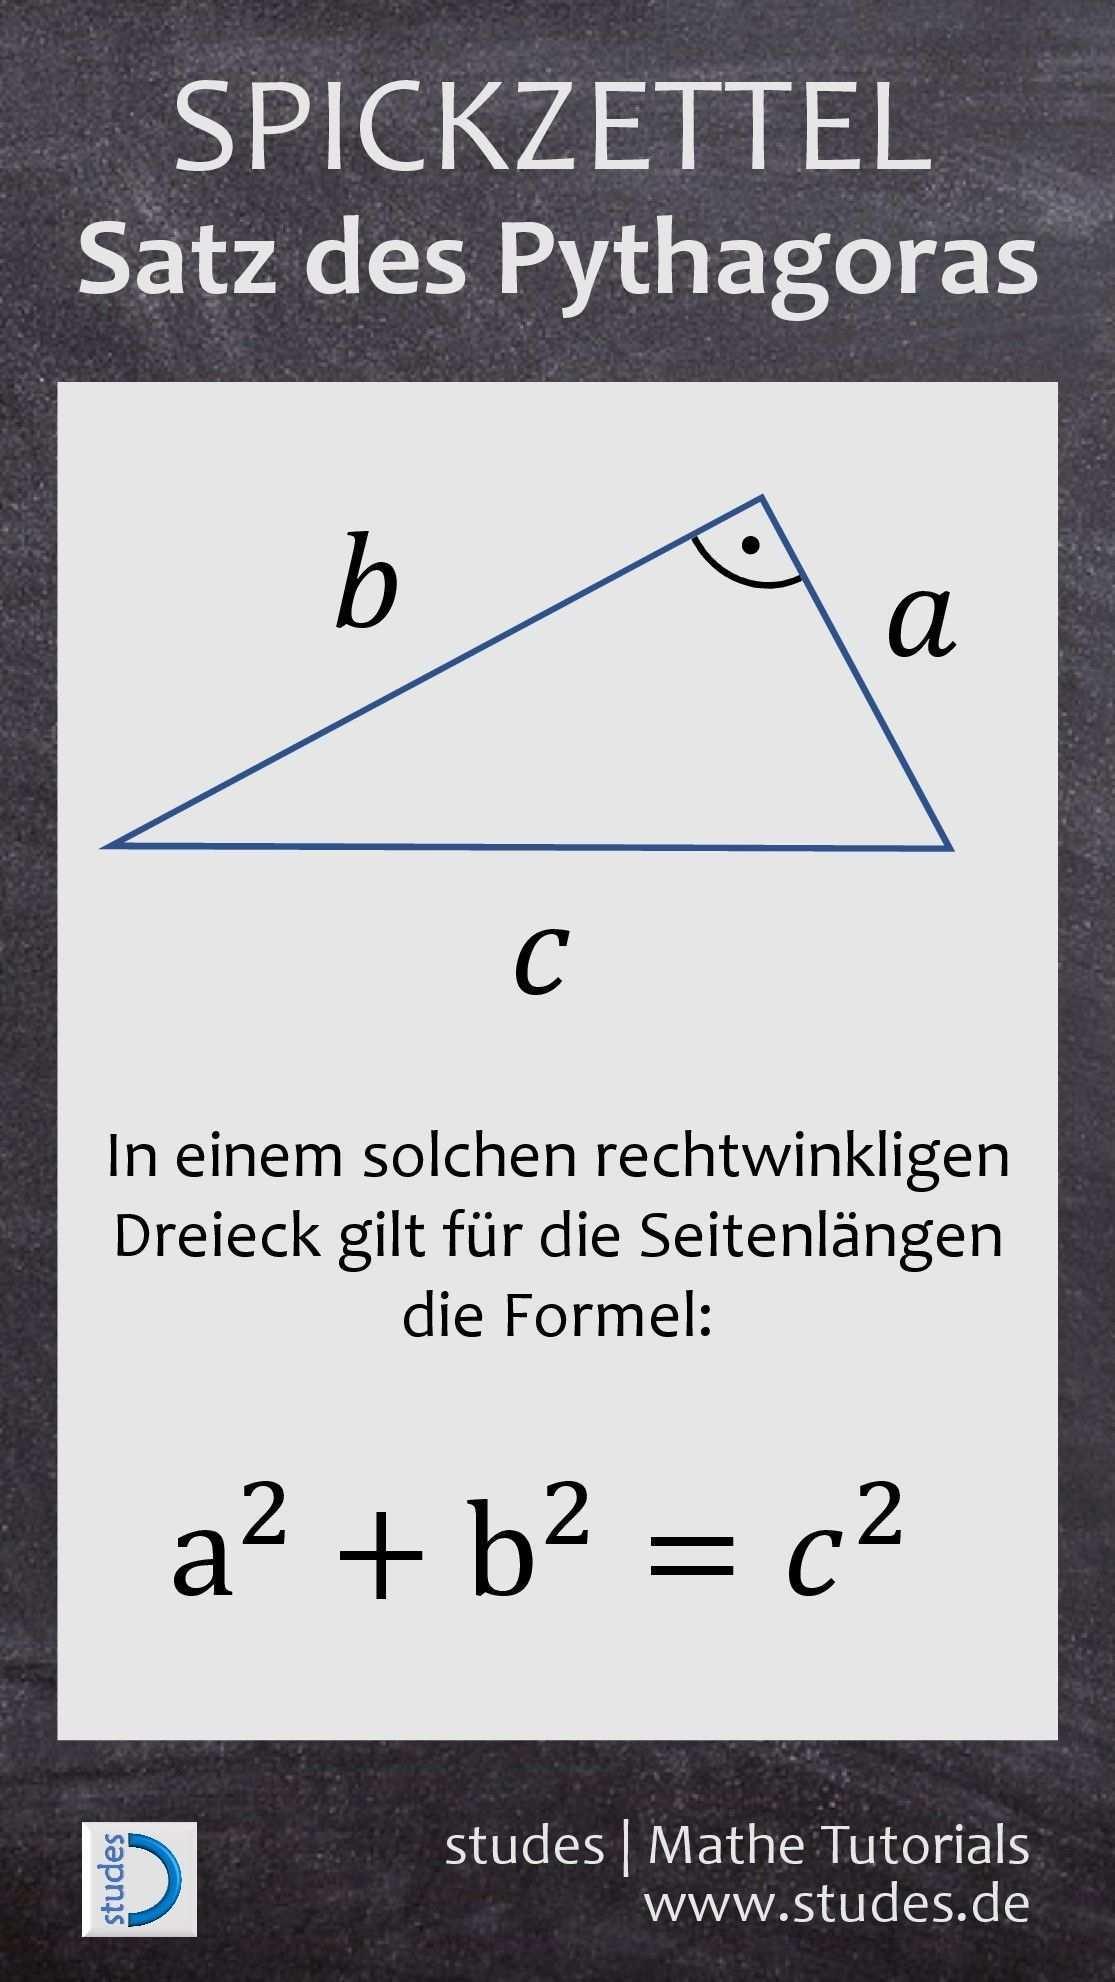 Spickzettel Studes Satz Des Pythagoras Nachhilfe Mathe Mathe Formeln